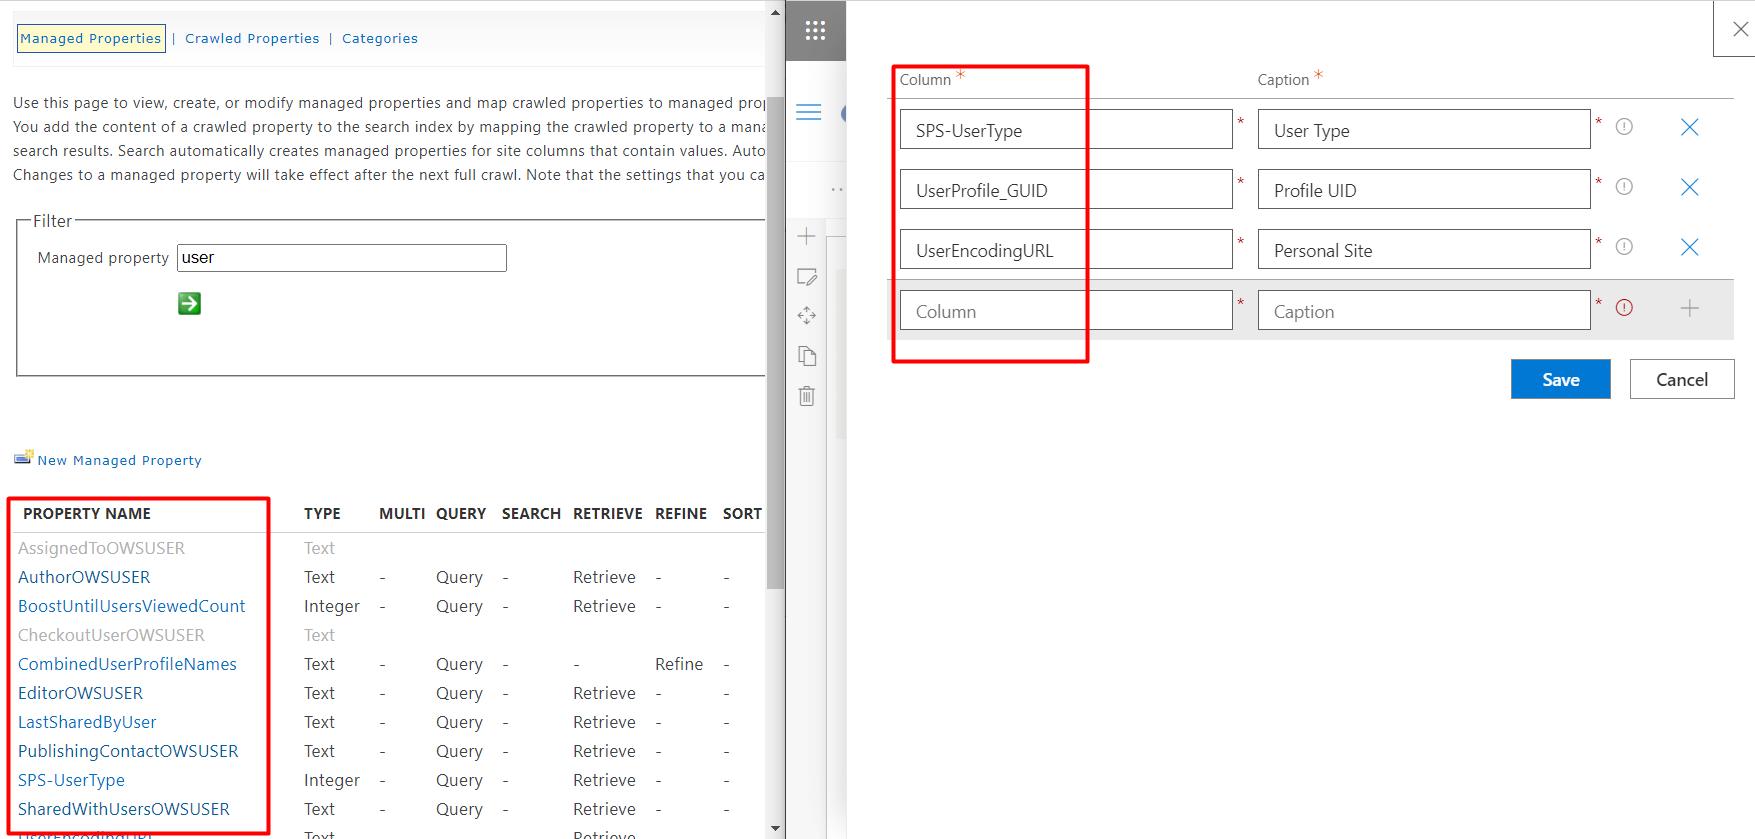 Adding Custom Attributes for User Profiles